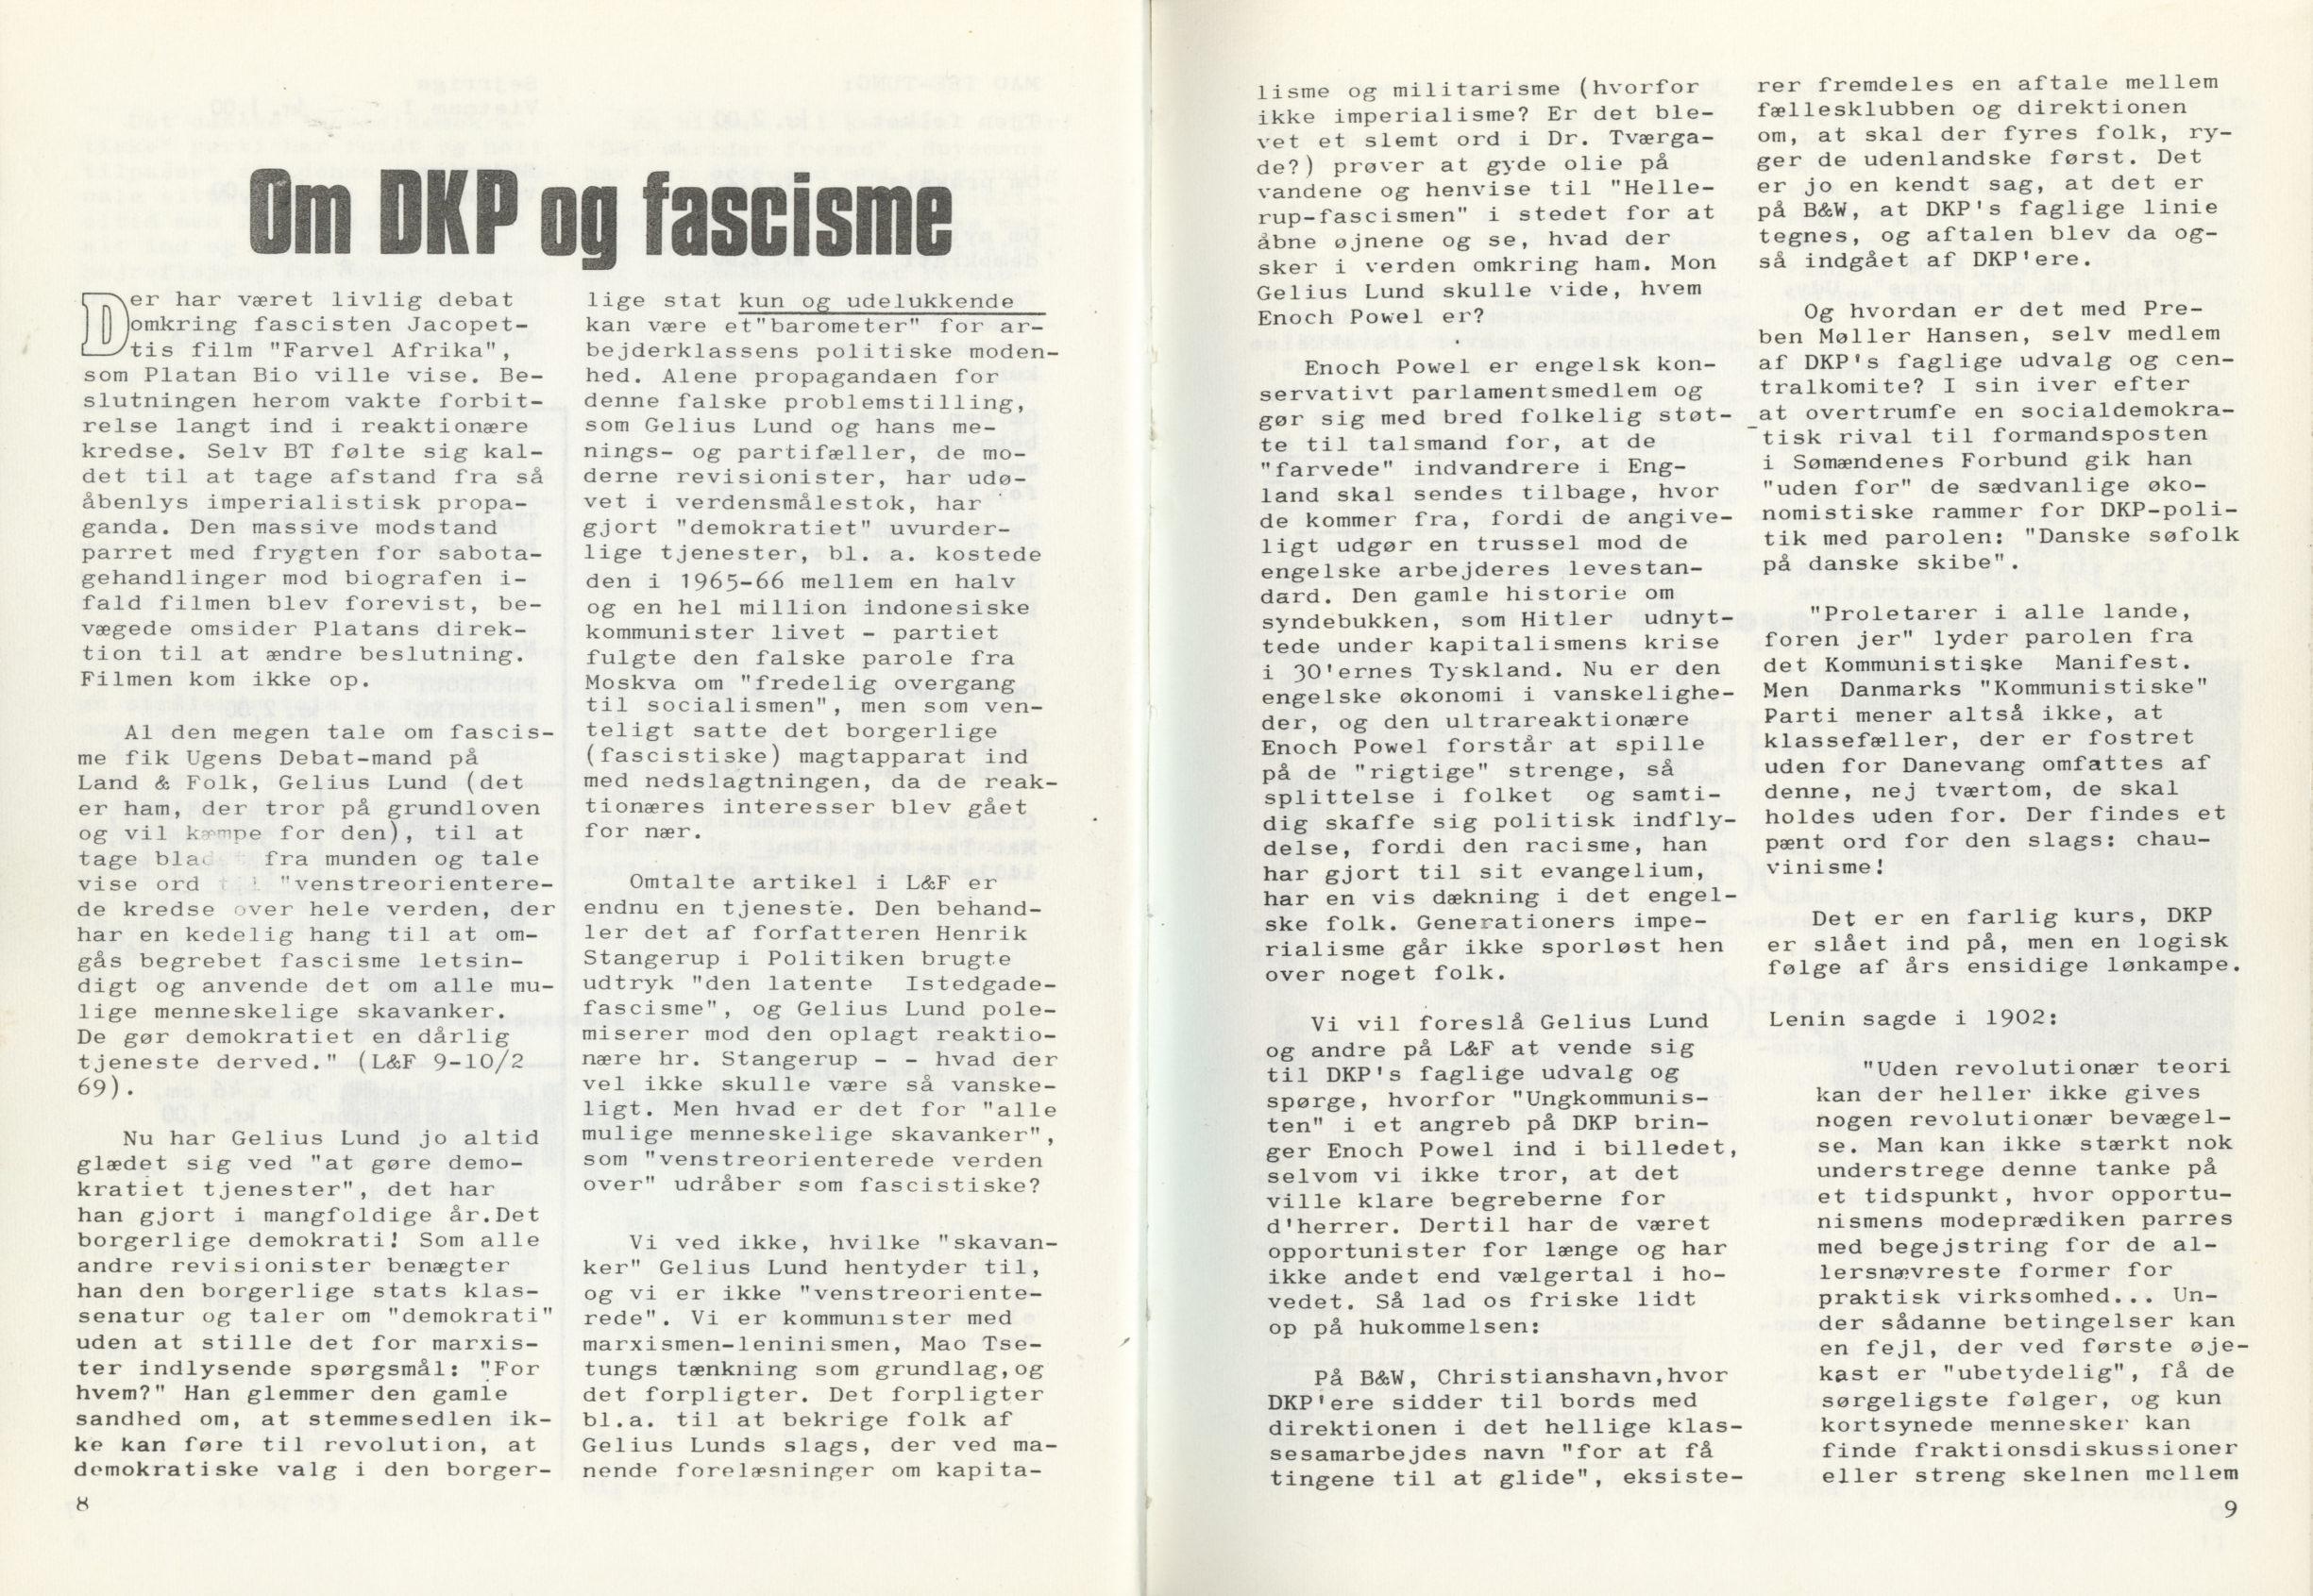 Ungkommunisten1969, nr. 4, s. 8-9.